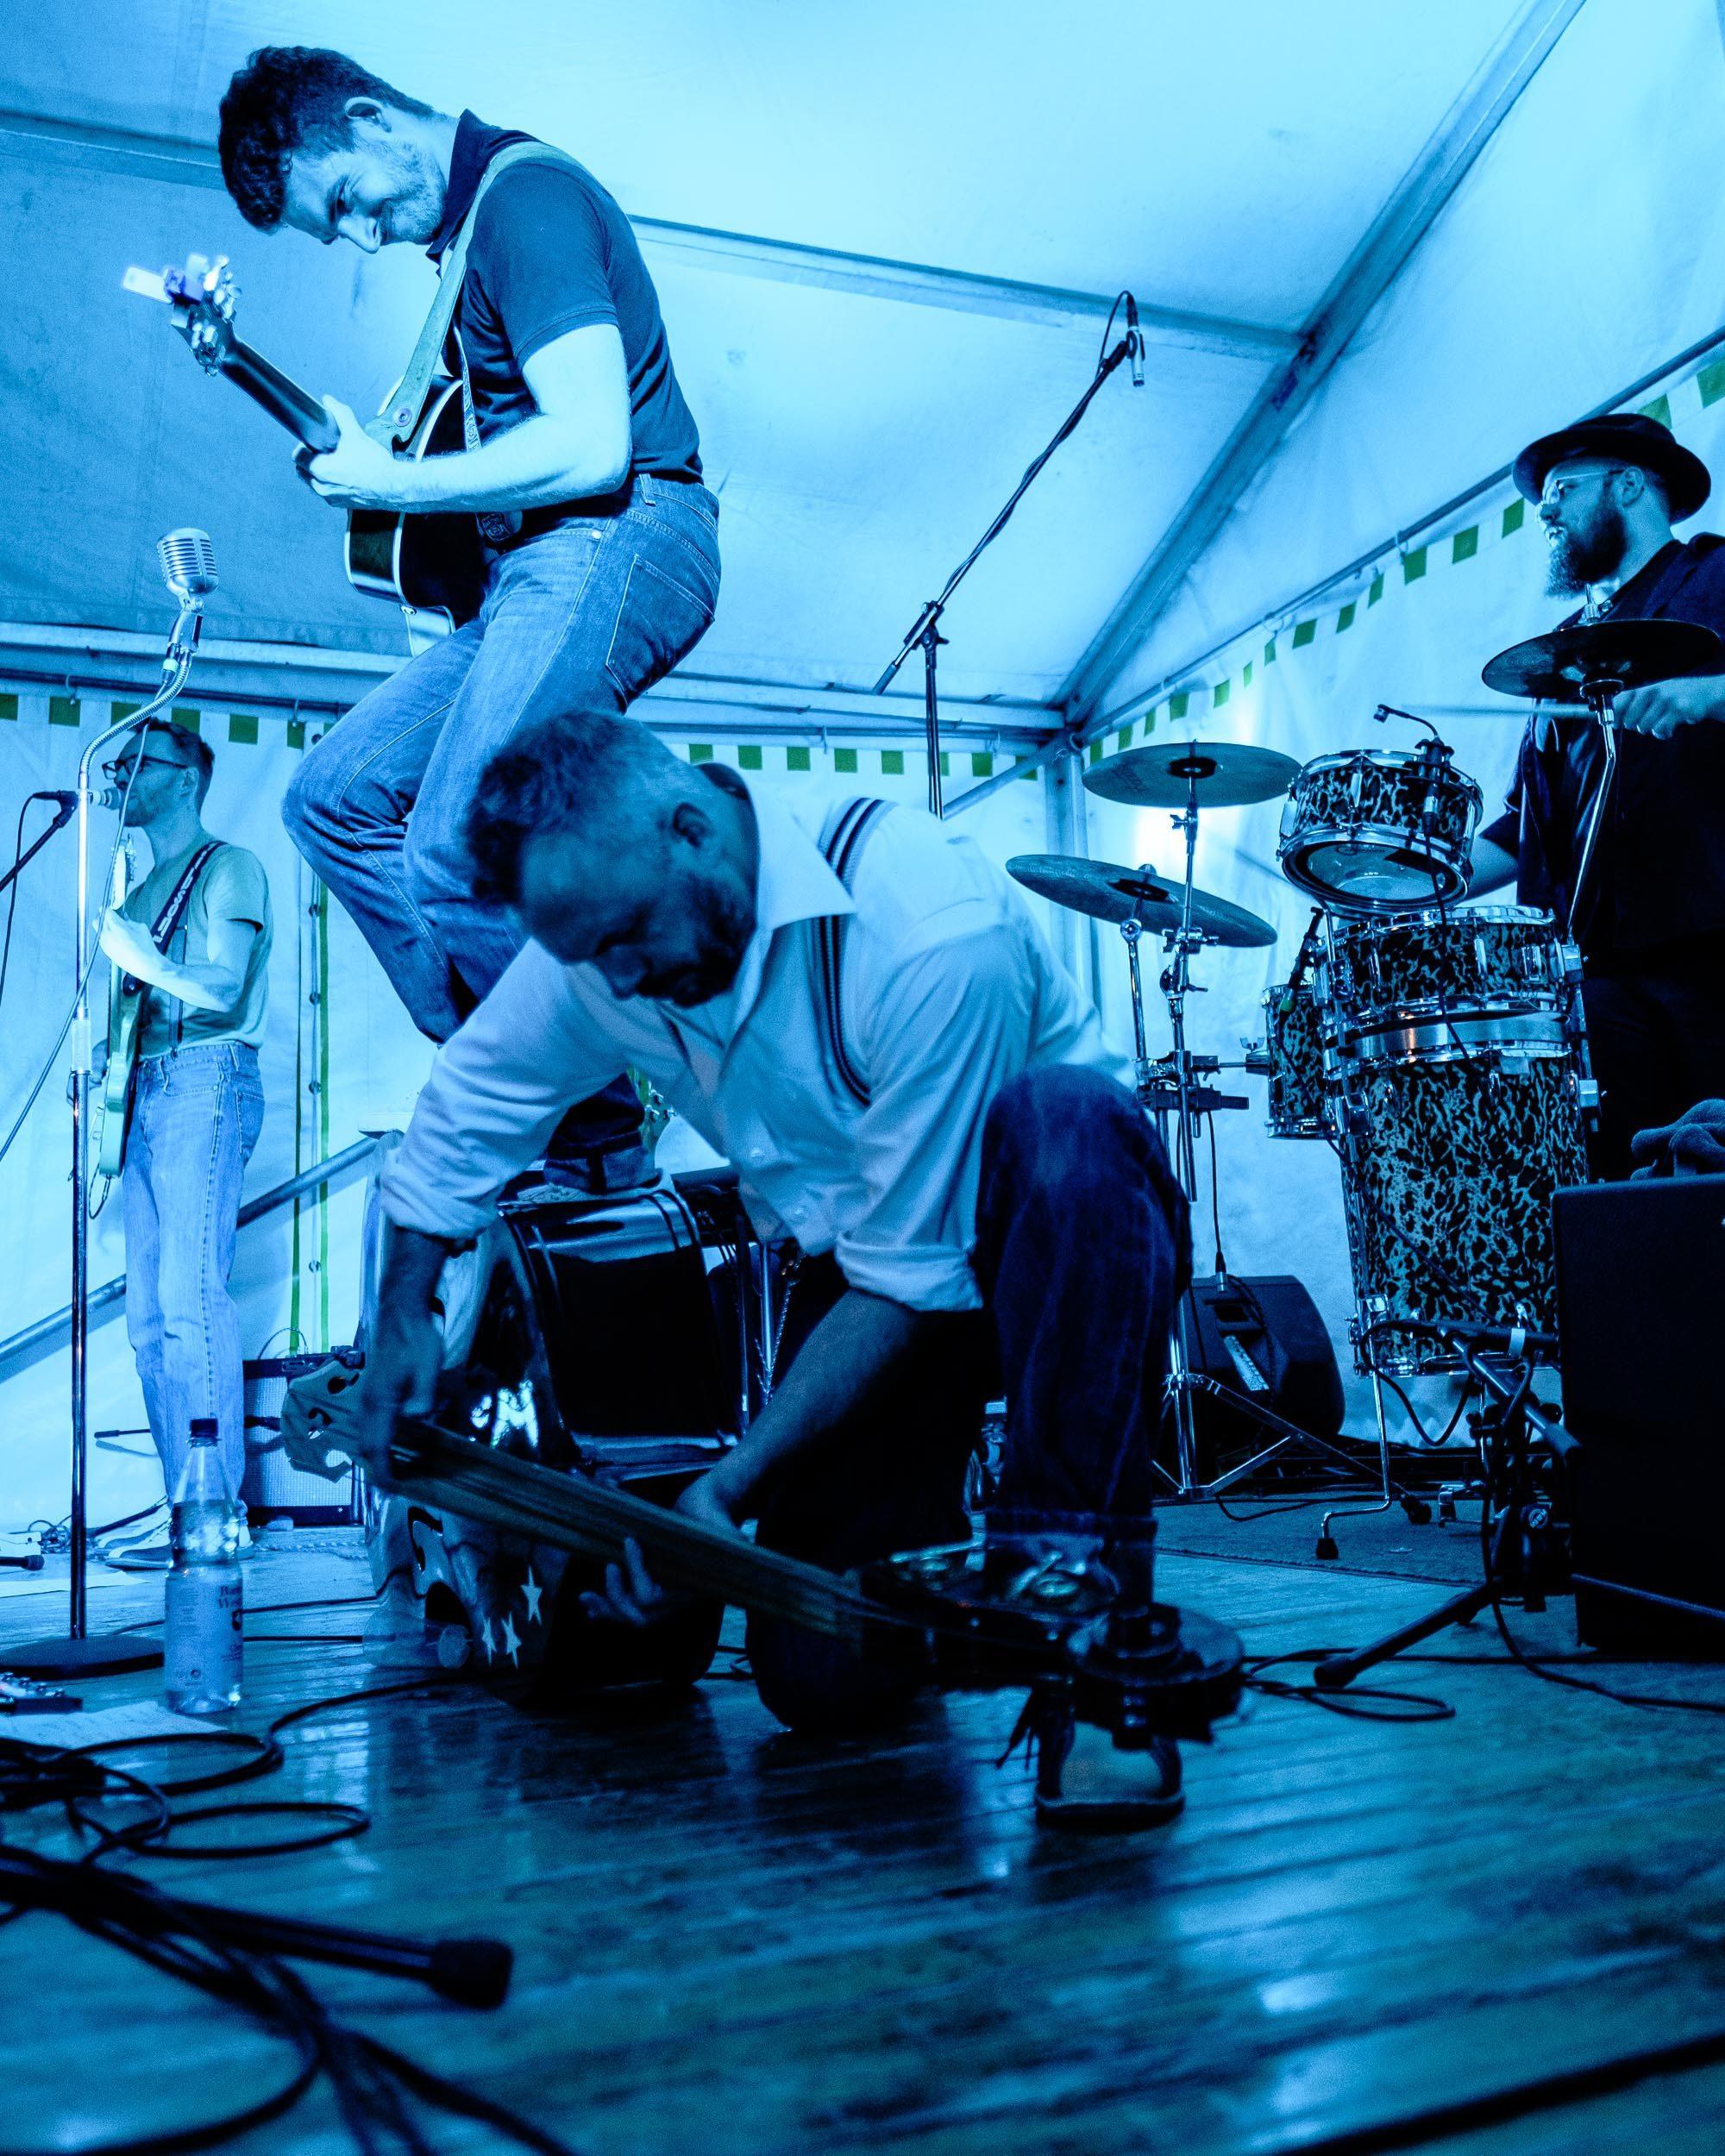 Ole und Maik, Dizzy Dudes, Konzert Vlotho Herblaub&Winterfest 2019